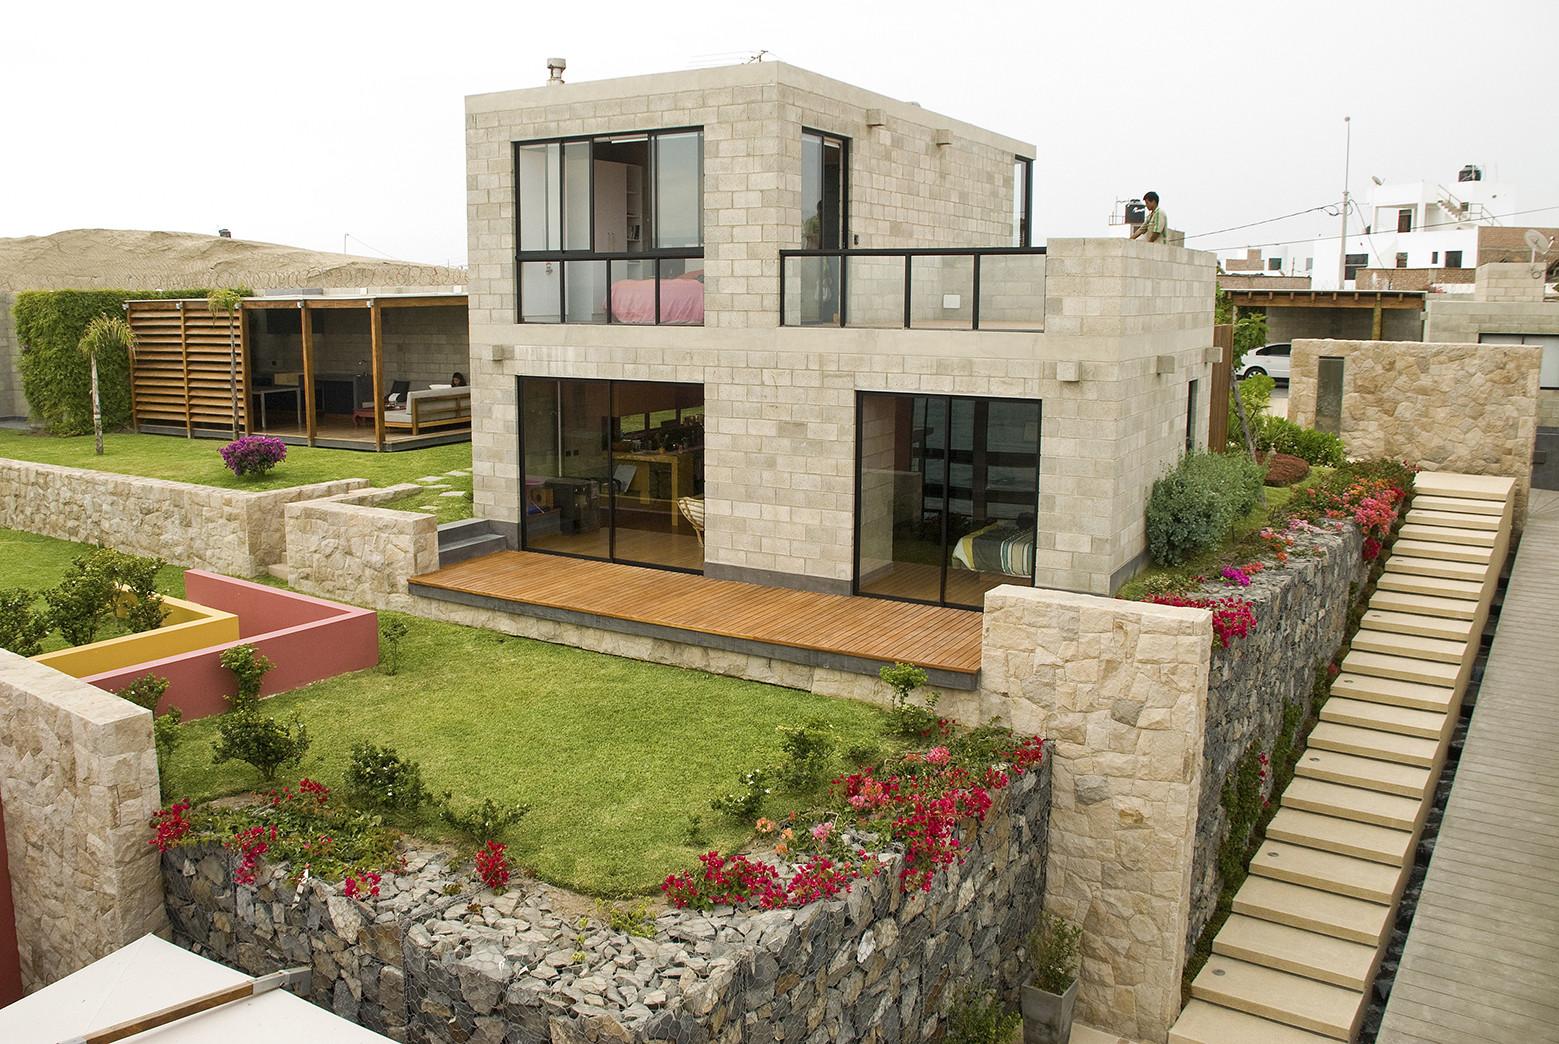 Casa alr vicca verde plataforma arquitectura - Casa con terreno ...